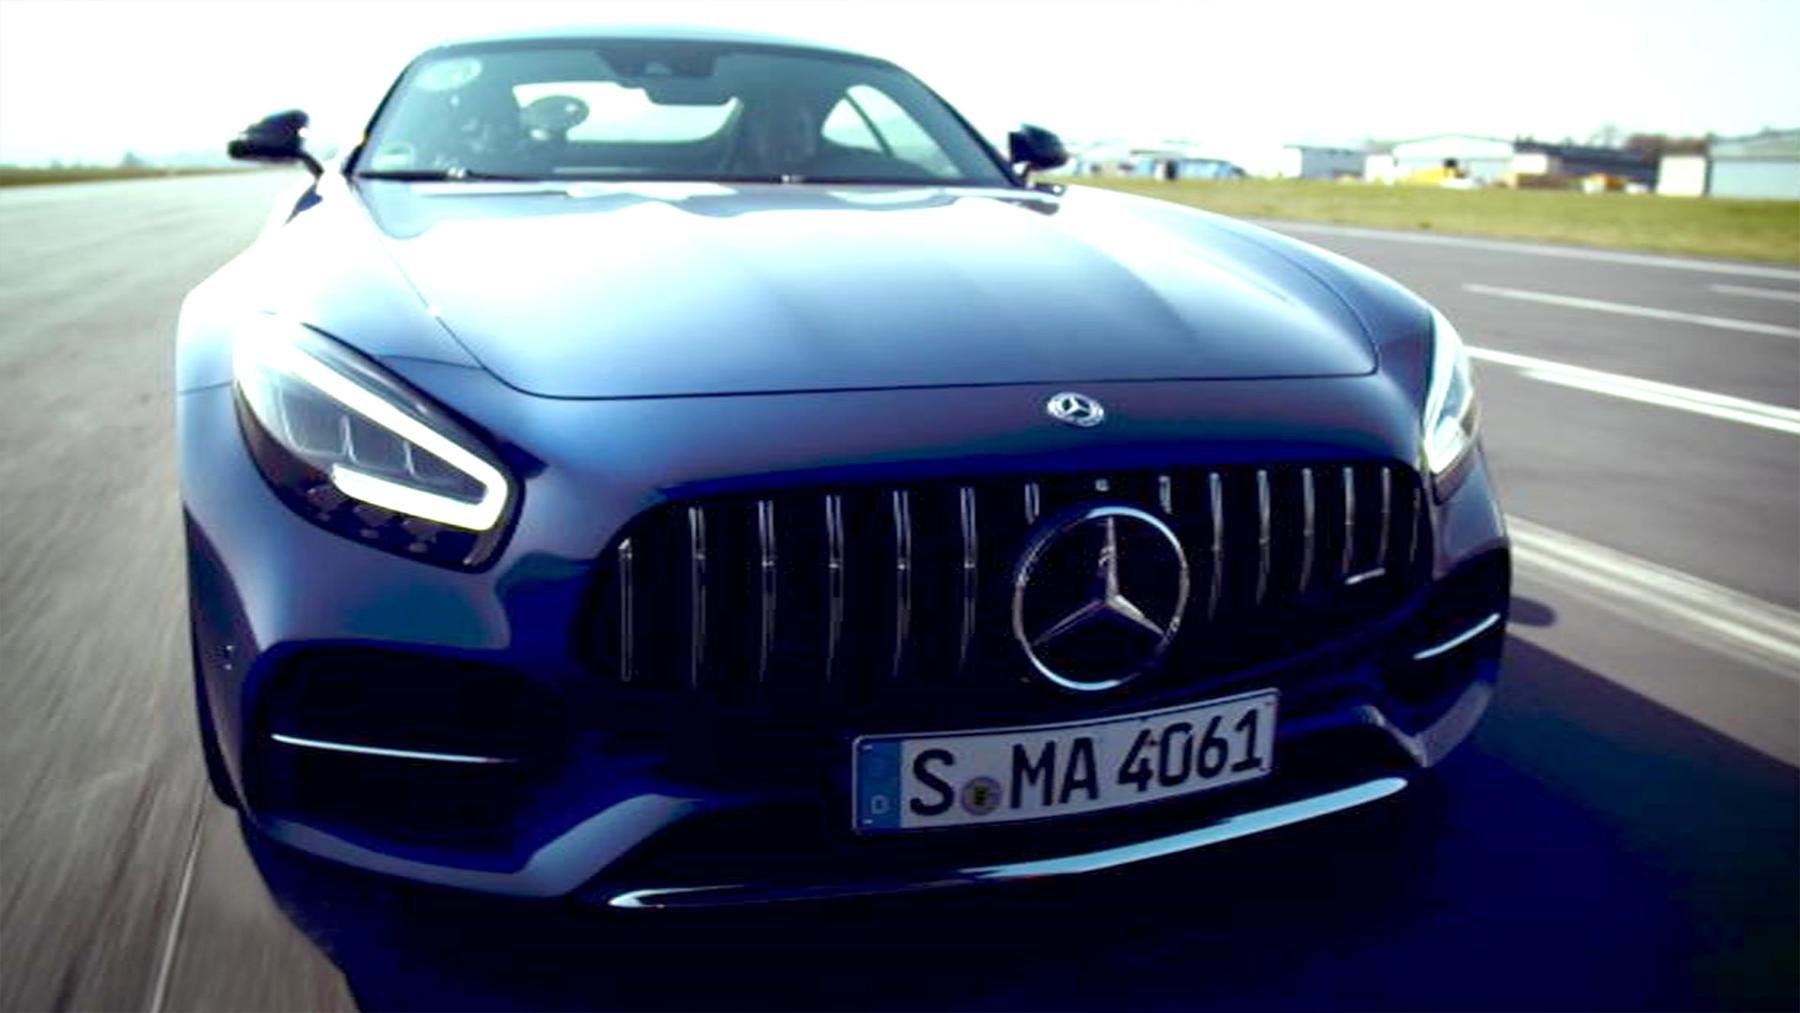 Thema u.a.: AMG Steuerung - Rennfahrer vs. Software   Folge 16